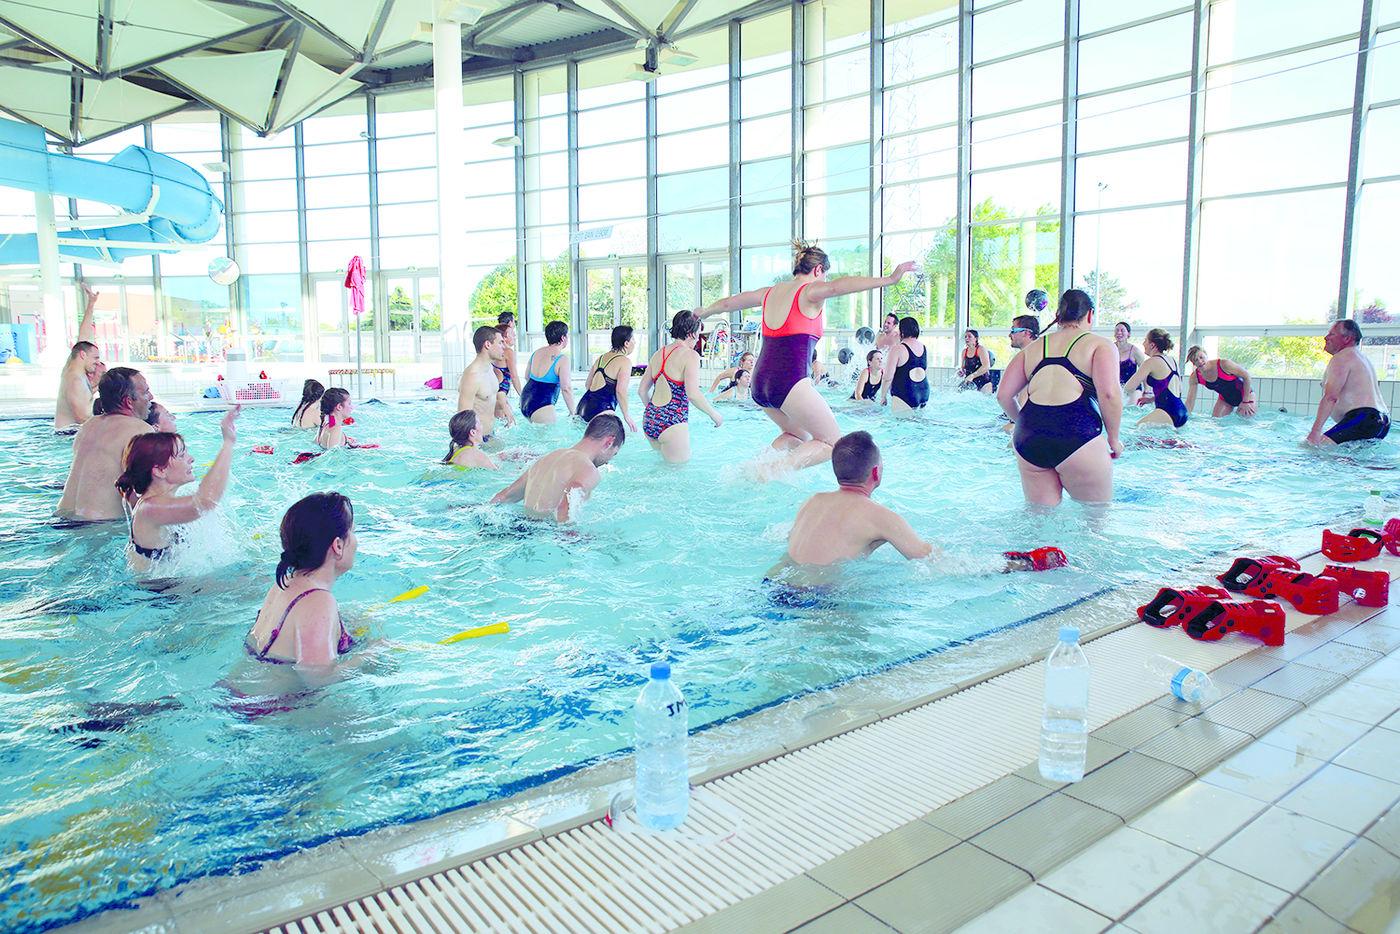 Séance D'aqua-Training : Mairie De Niort à Piscine Chauray